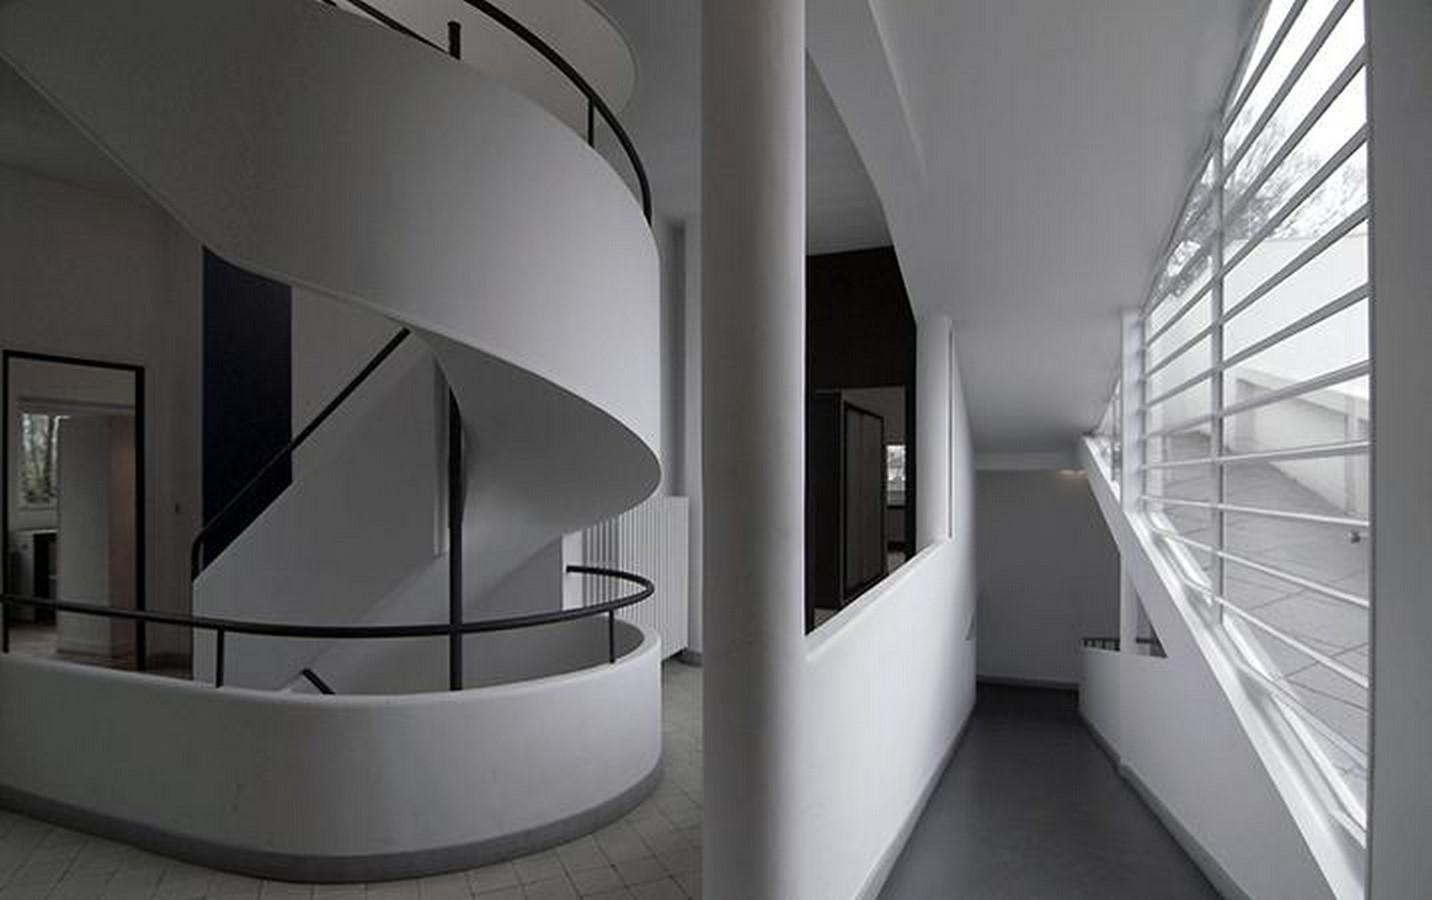 Villa Savoye - Sheet3